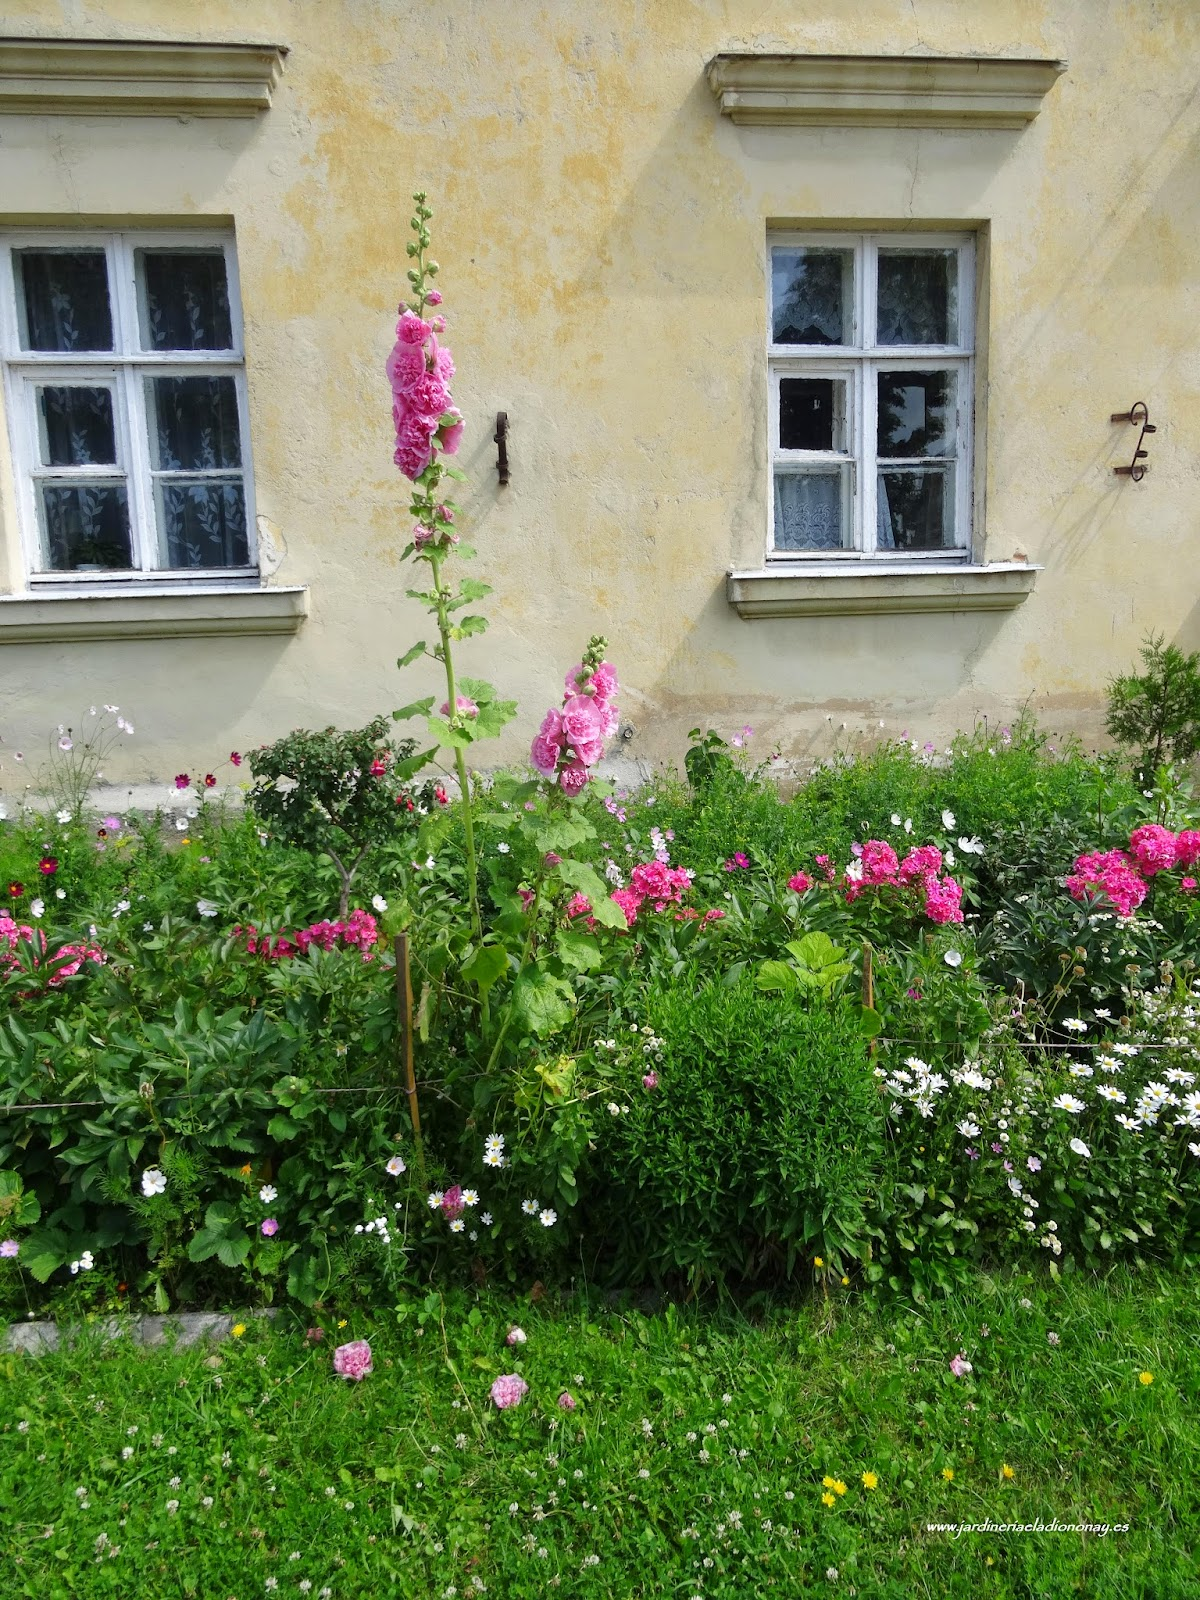 Jardineria eladio nonay diferencia macizo arriate for Arriate jardin